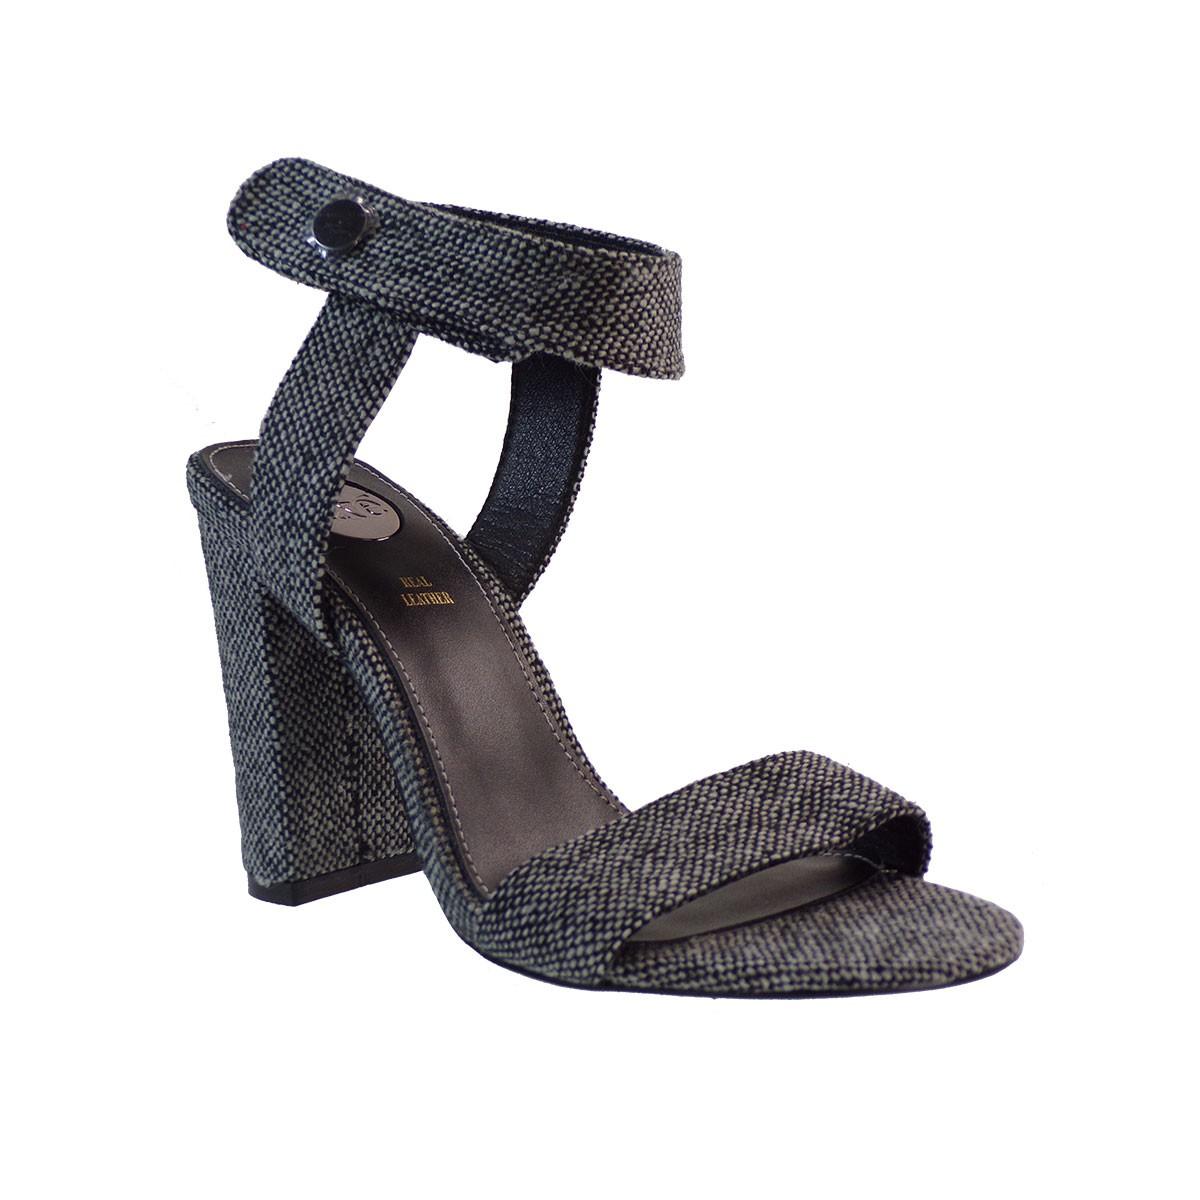 EXE Shoes Πέδιλα Γυναικεία LIDIA-273 Λευκό-Μαύρο I4700273548305